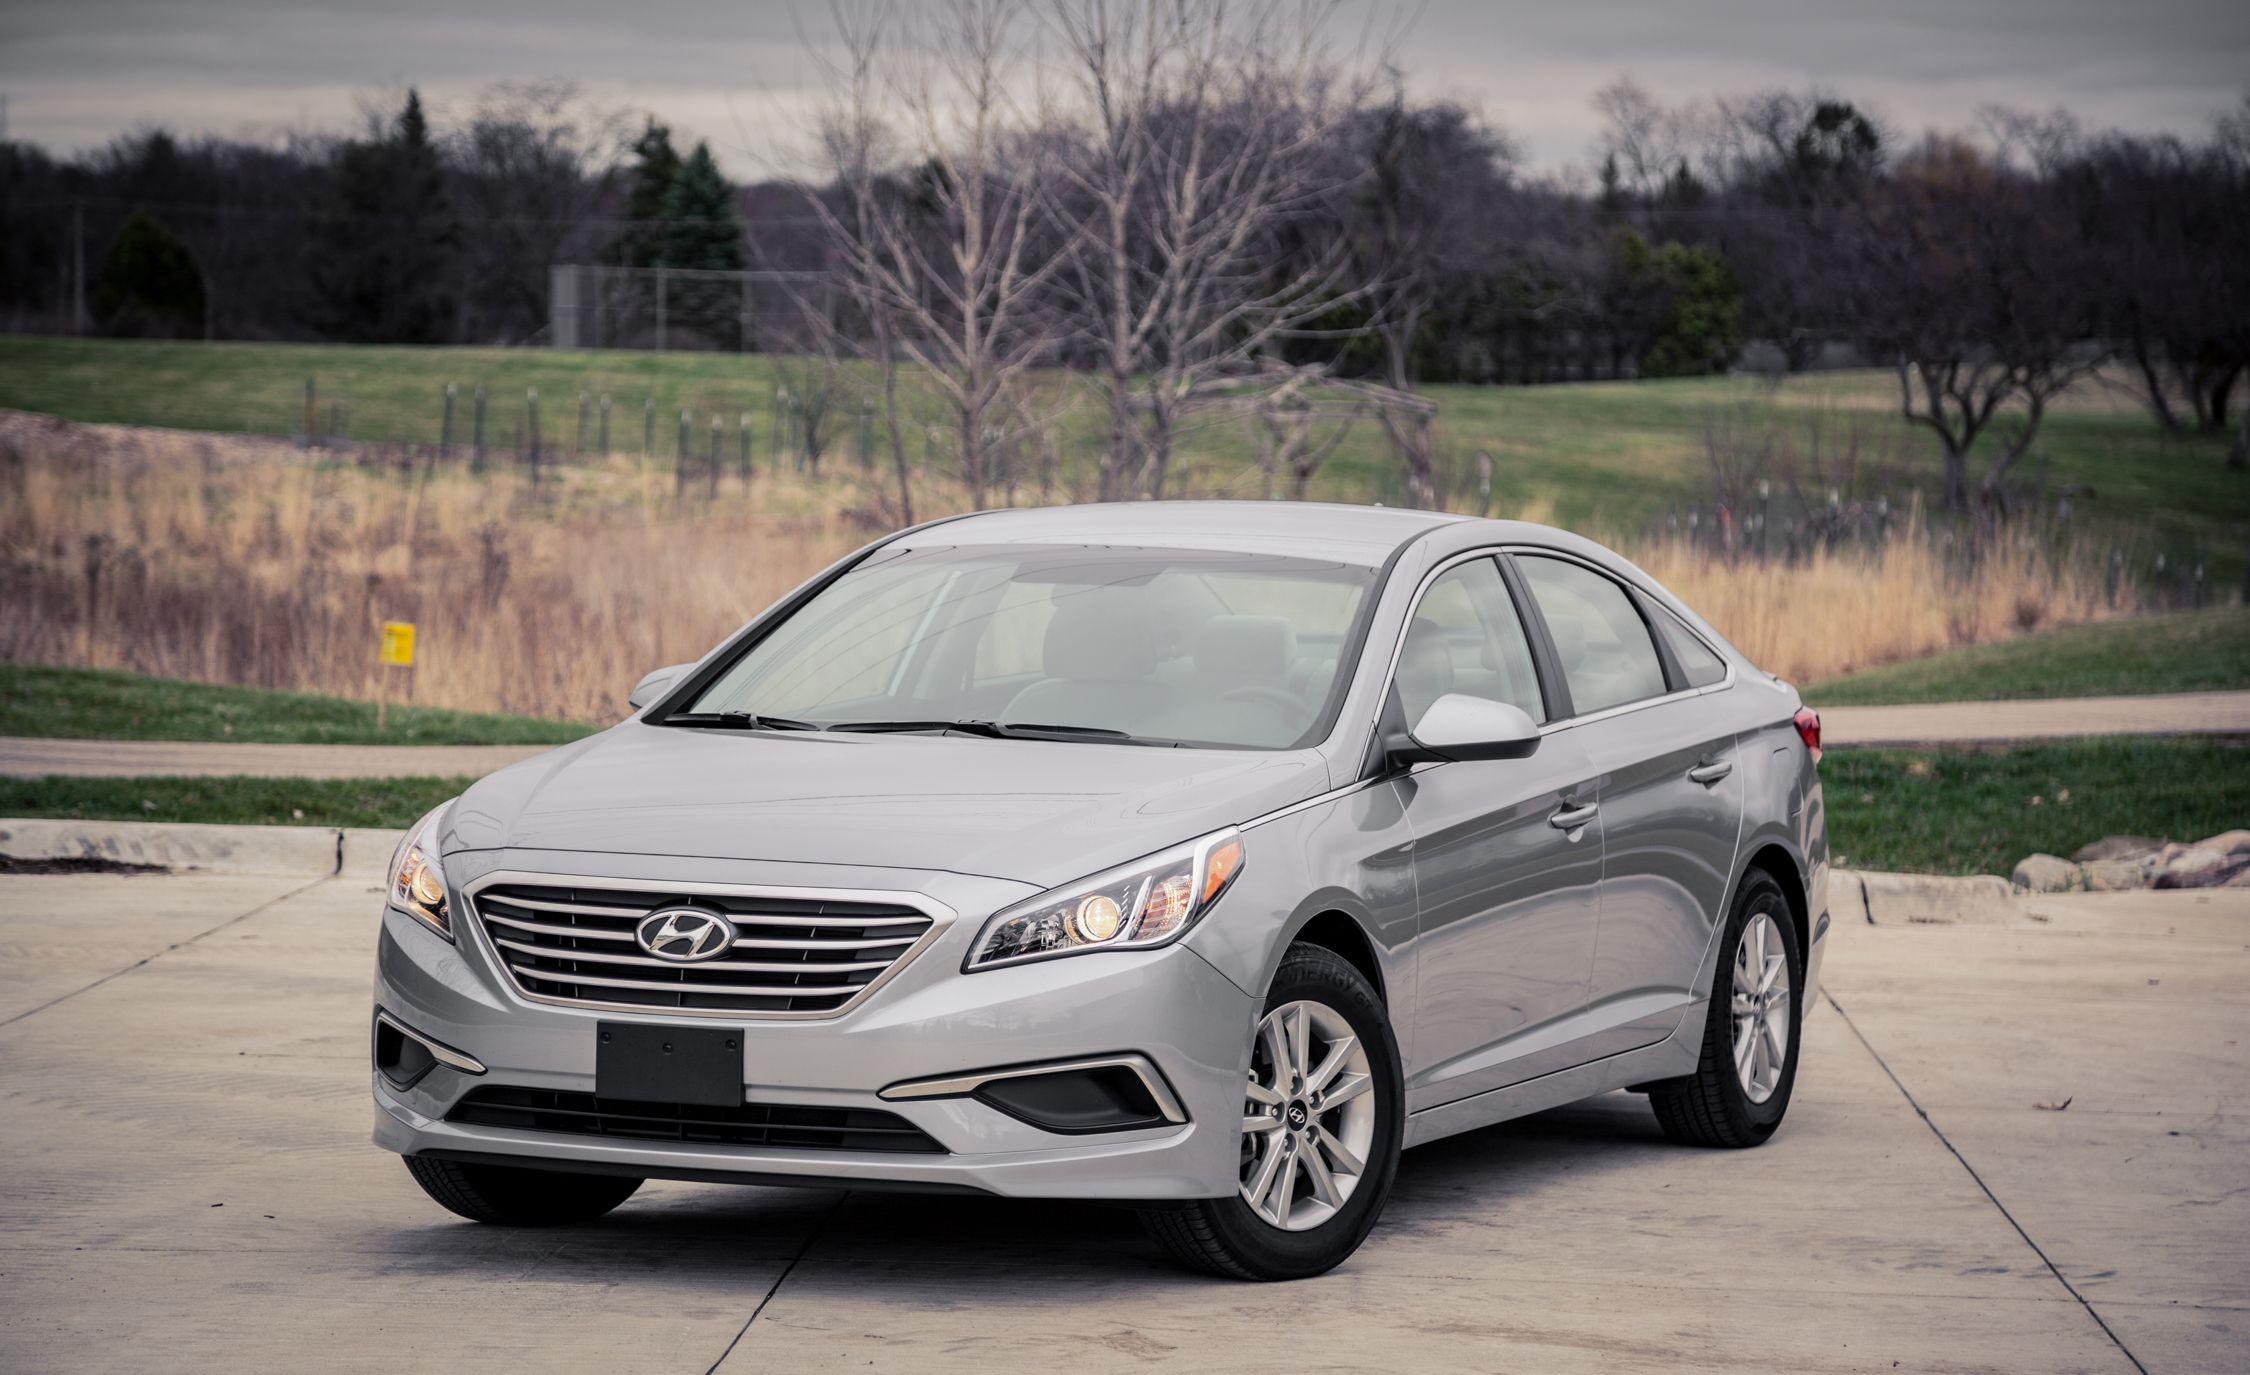 Hyundai Sonata: If you have a flat tire while driving